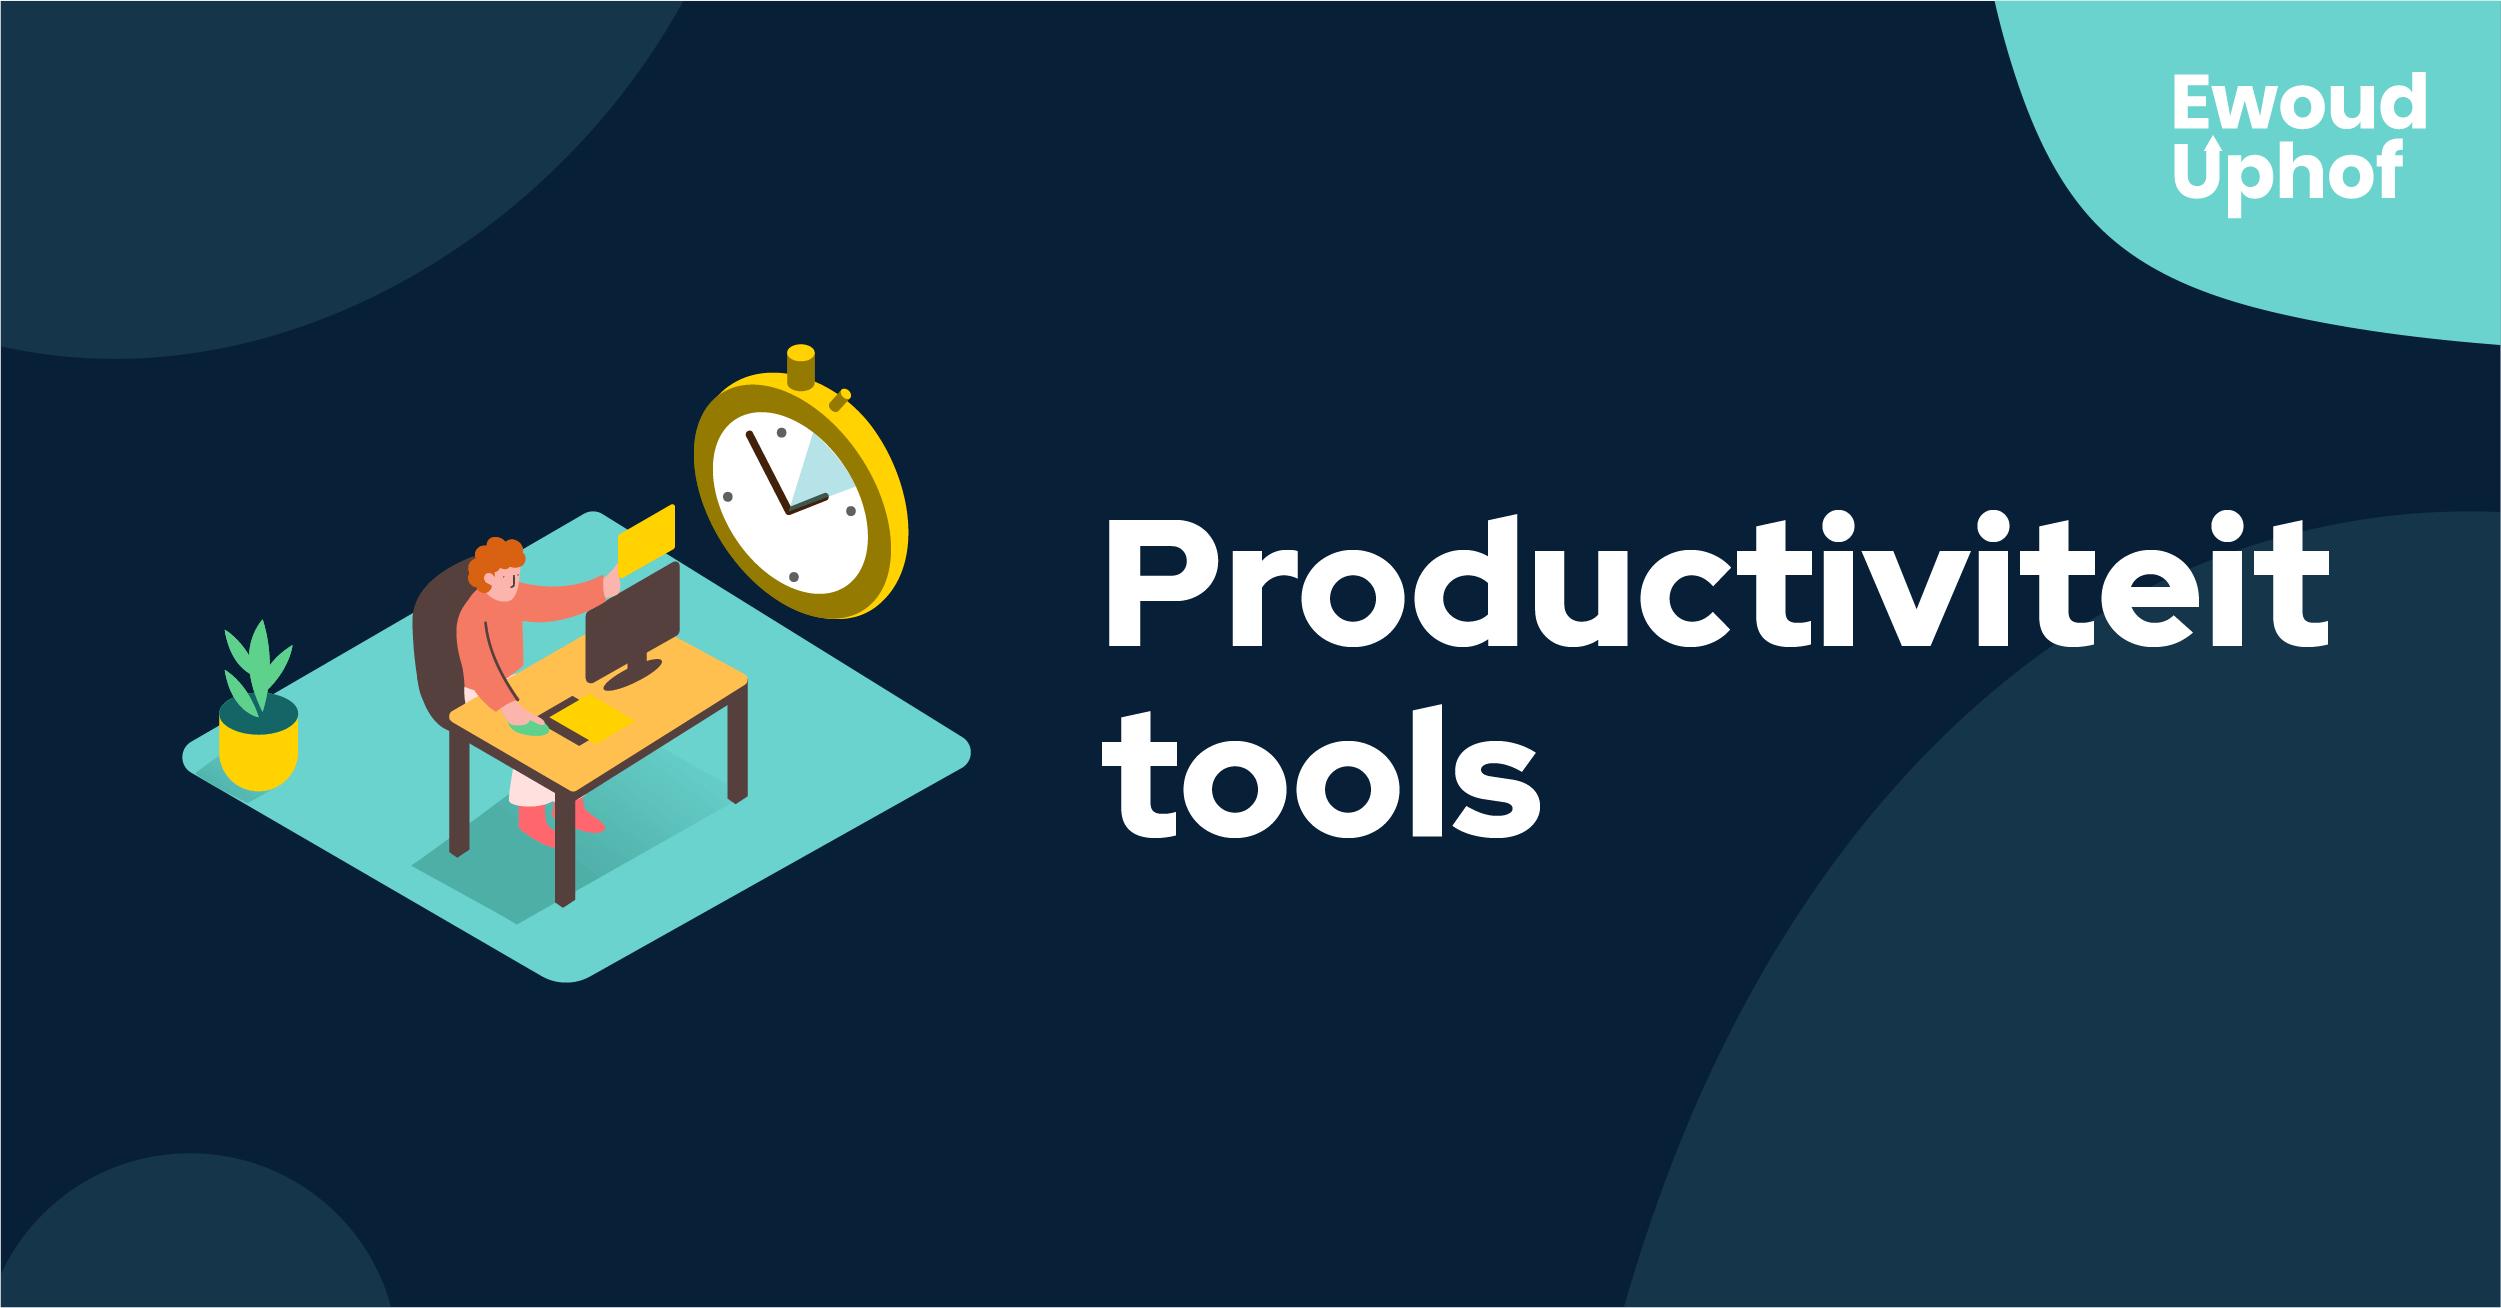 Productiviteit tools